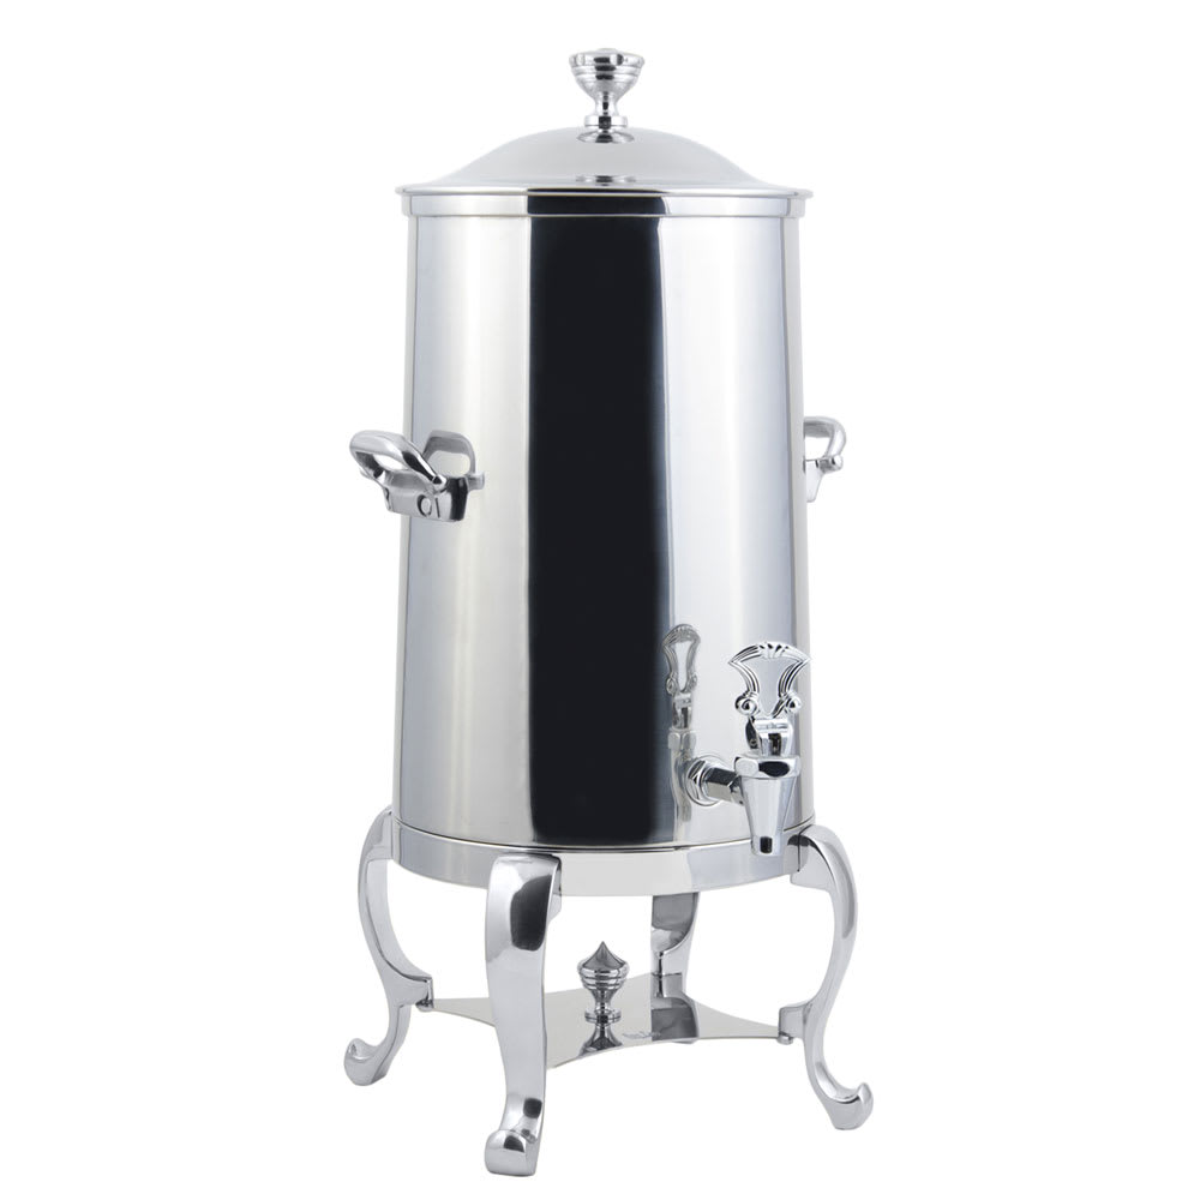 Bon Chef 49003C 3 gal Insulated Coffee Urn Server, Chrome, Roman